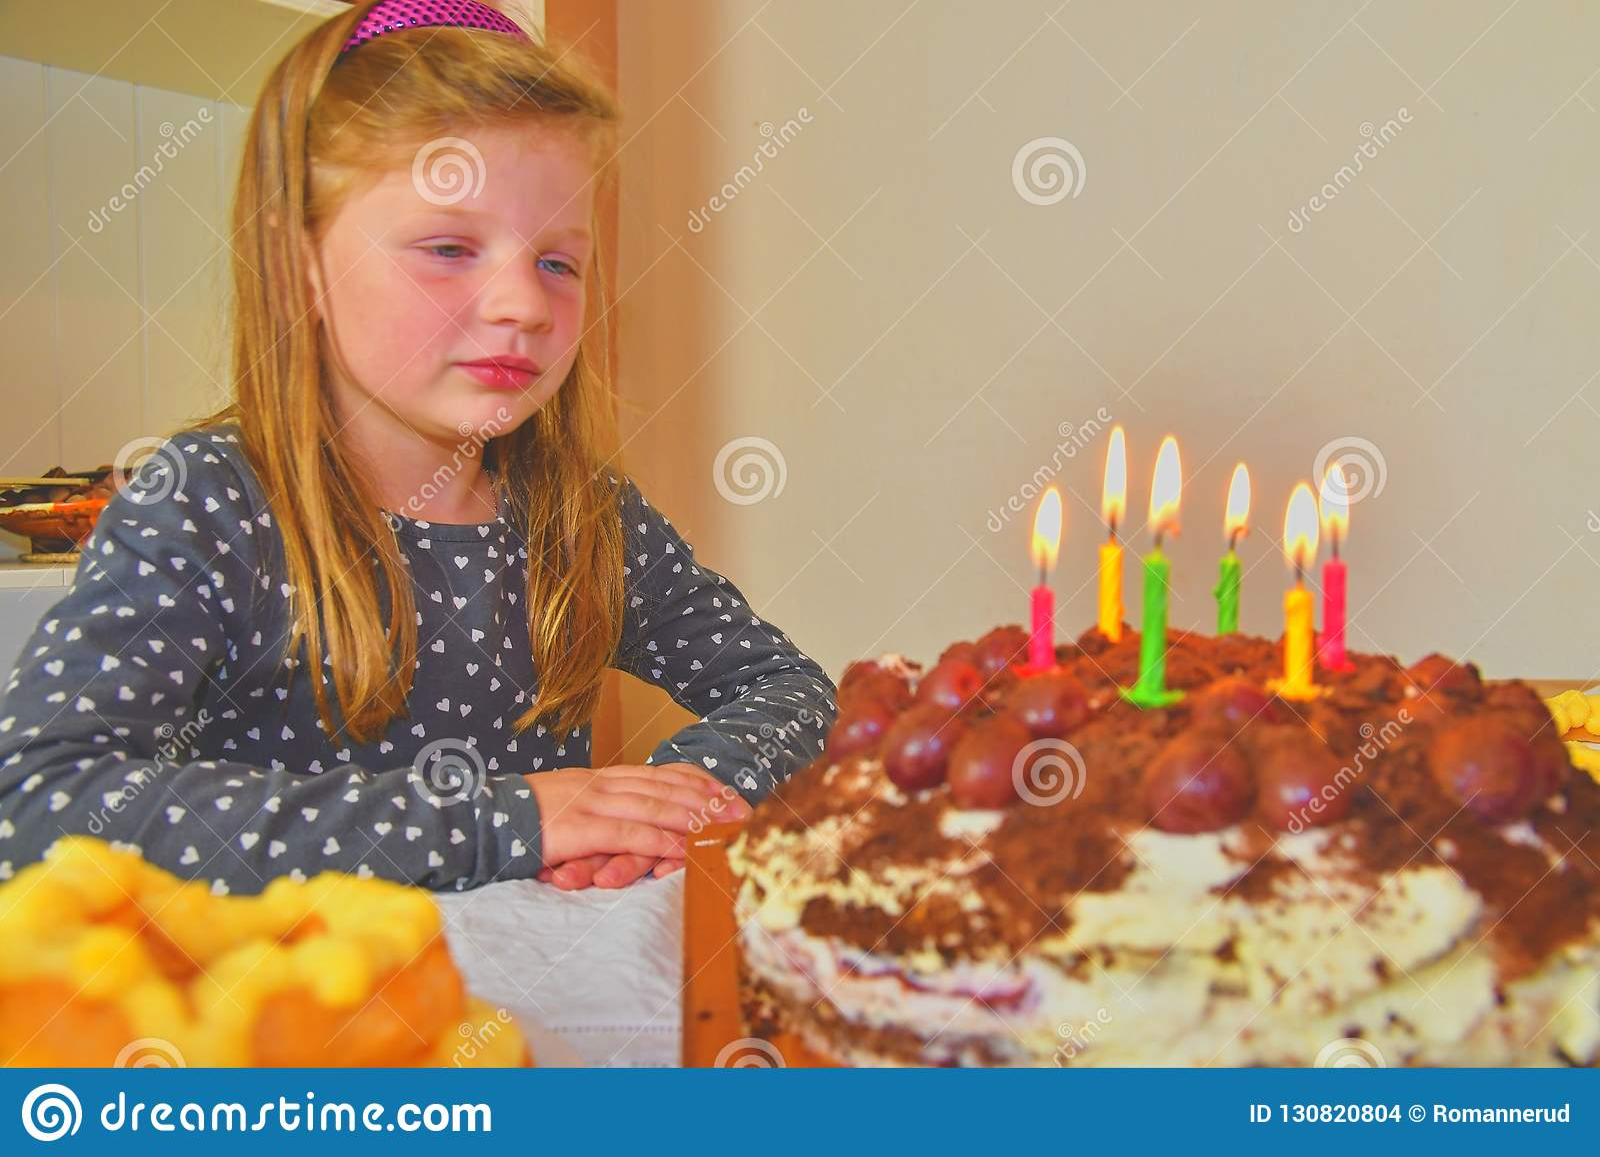 Little girl looking on her birthday cake. Small girl celebrating her six birthday. Birthday cake and little girl